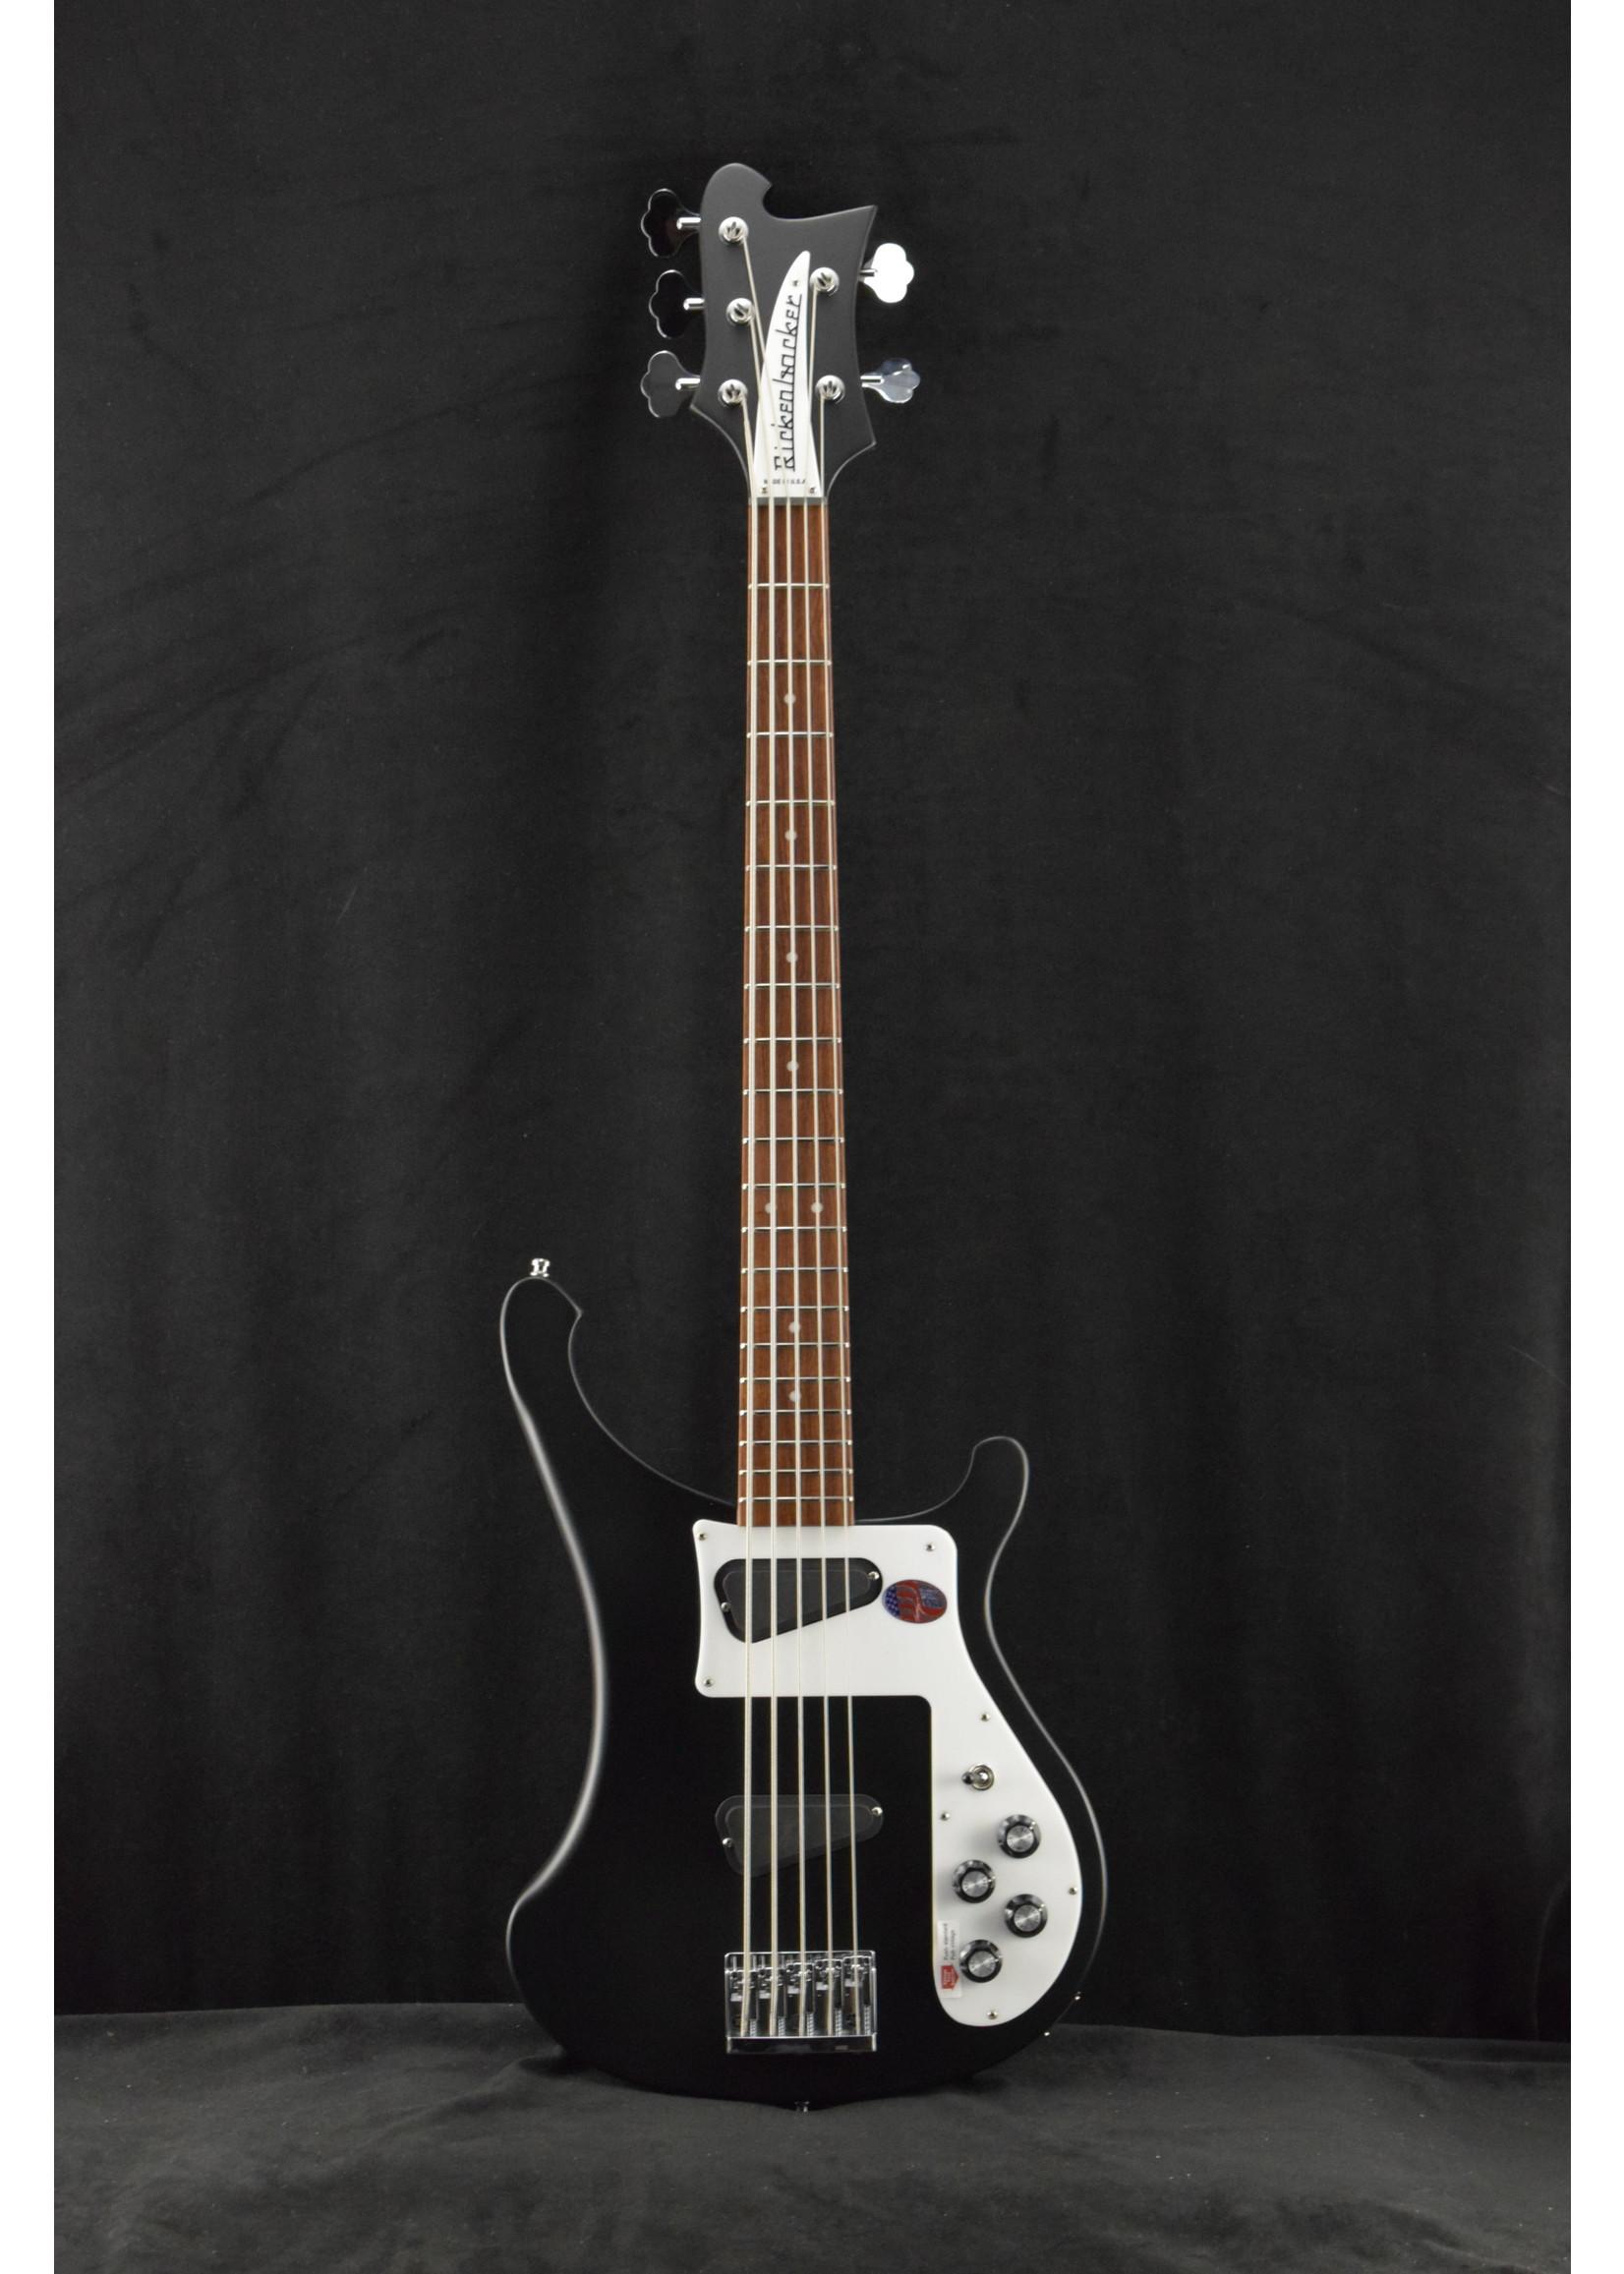 Rickenbacker Rickenbacker 4003S/5 5-String Bass Matte Black with Hardshell Case